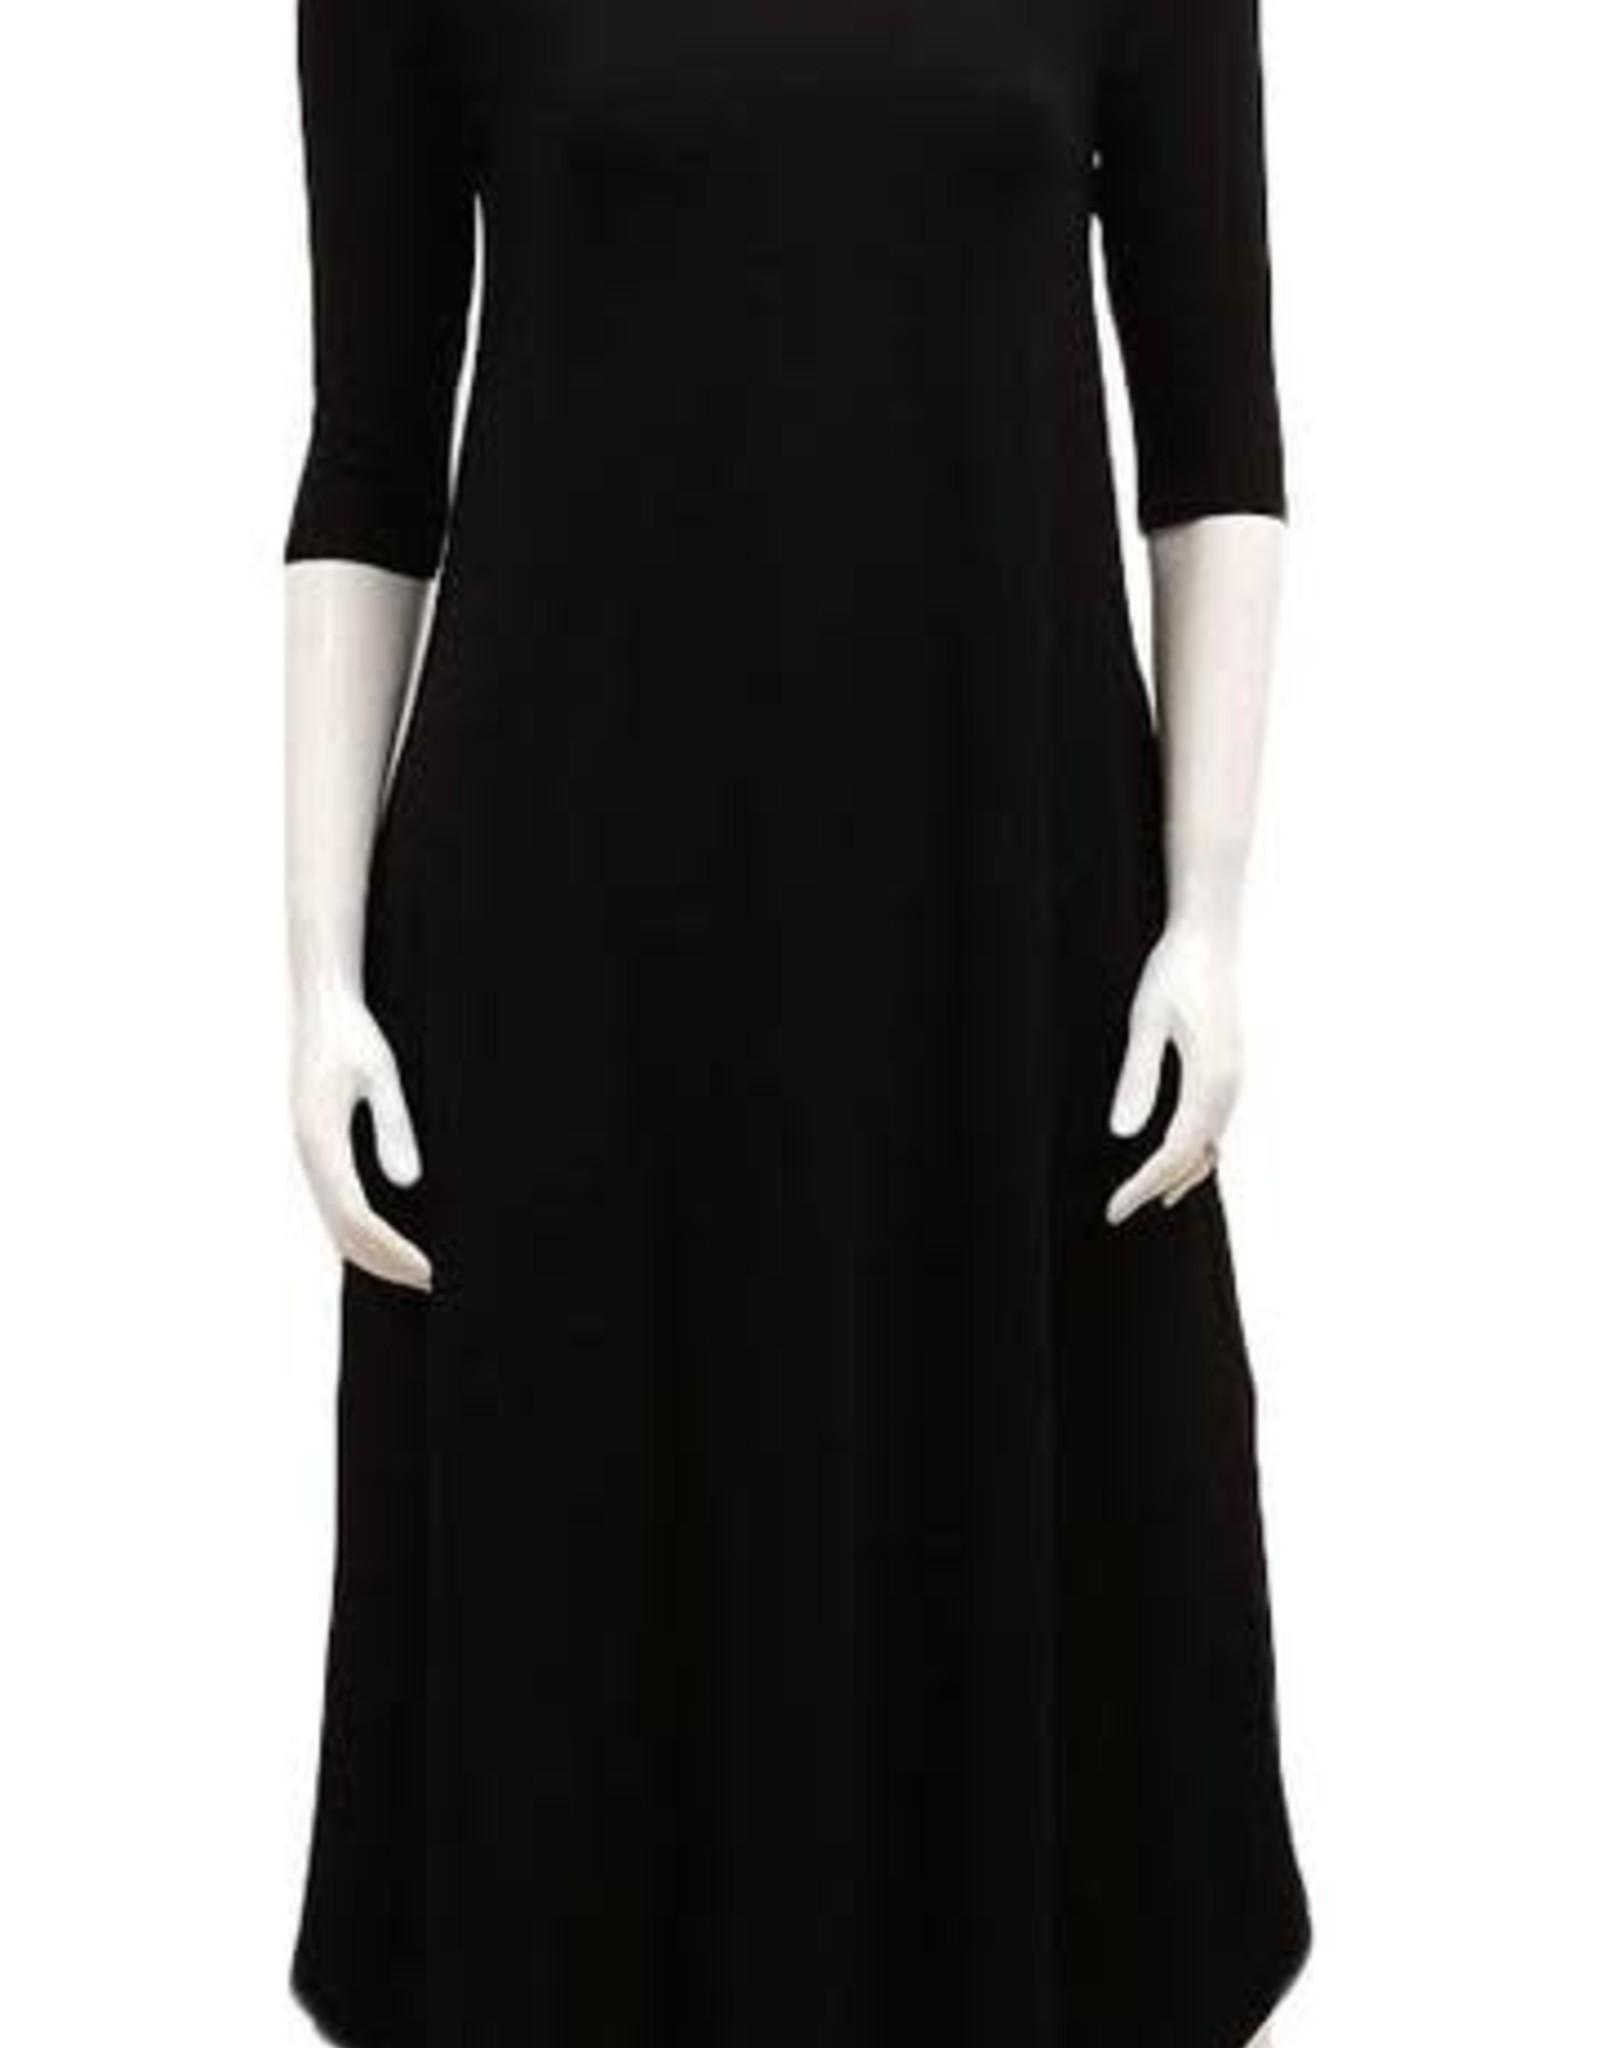 Gilmour Gilmour Bamboo 3/4 Sleeve Shirttail Maxi Dress, Black